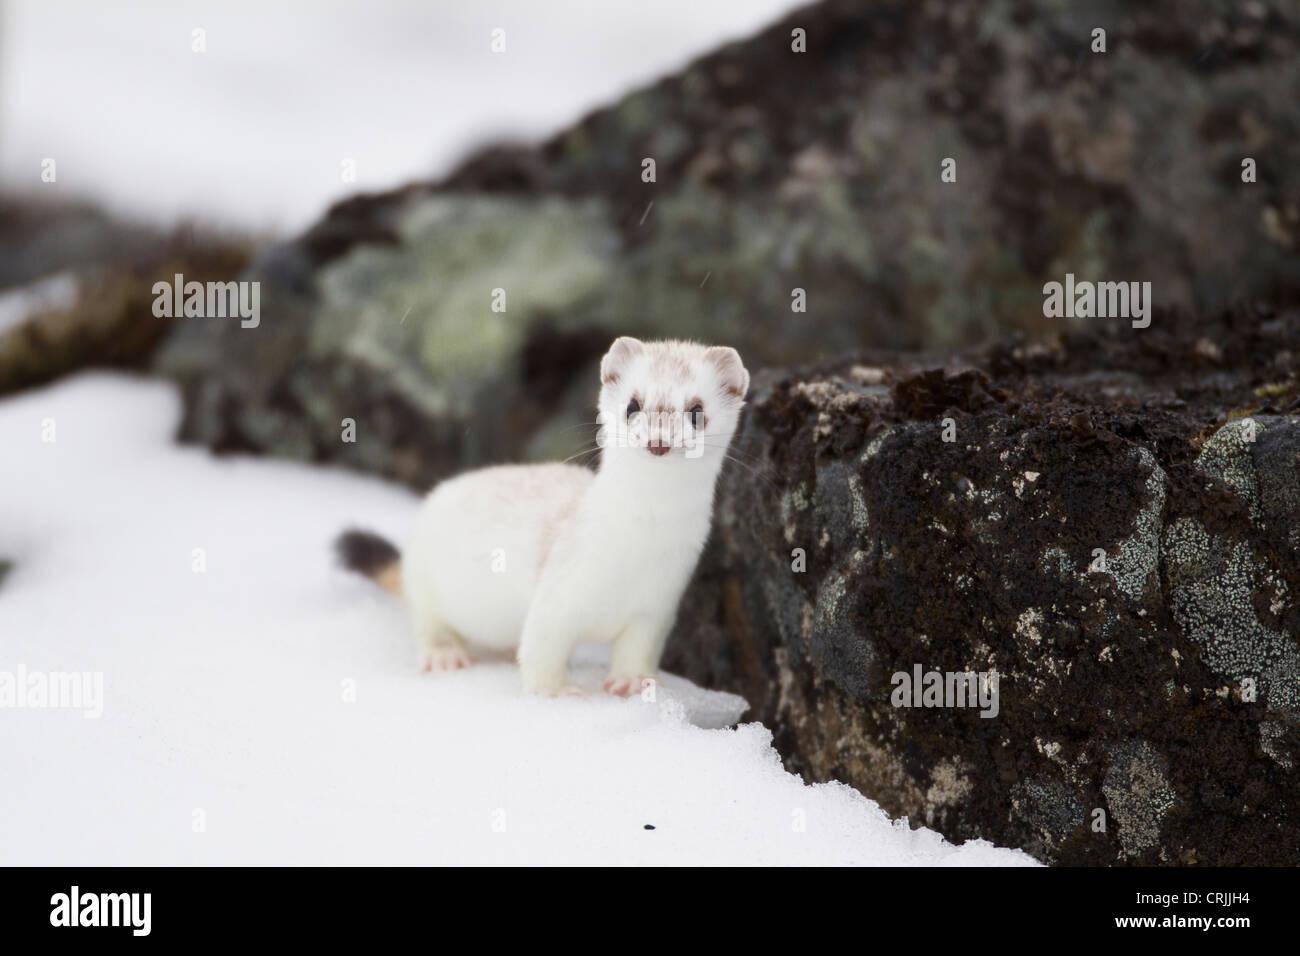 Brooks Range, Arctic National Wildlife Refuge (ANWR), Alaska, a short-tailed weasel darts among rocks - Stock Image